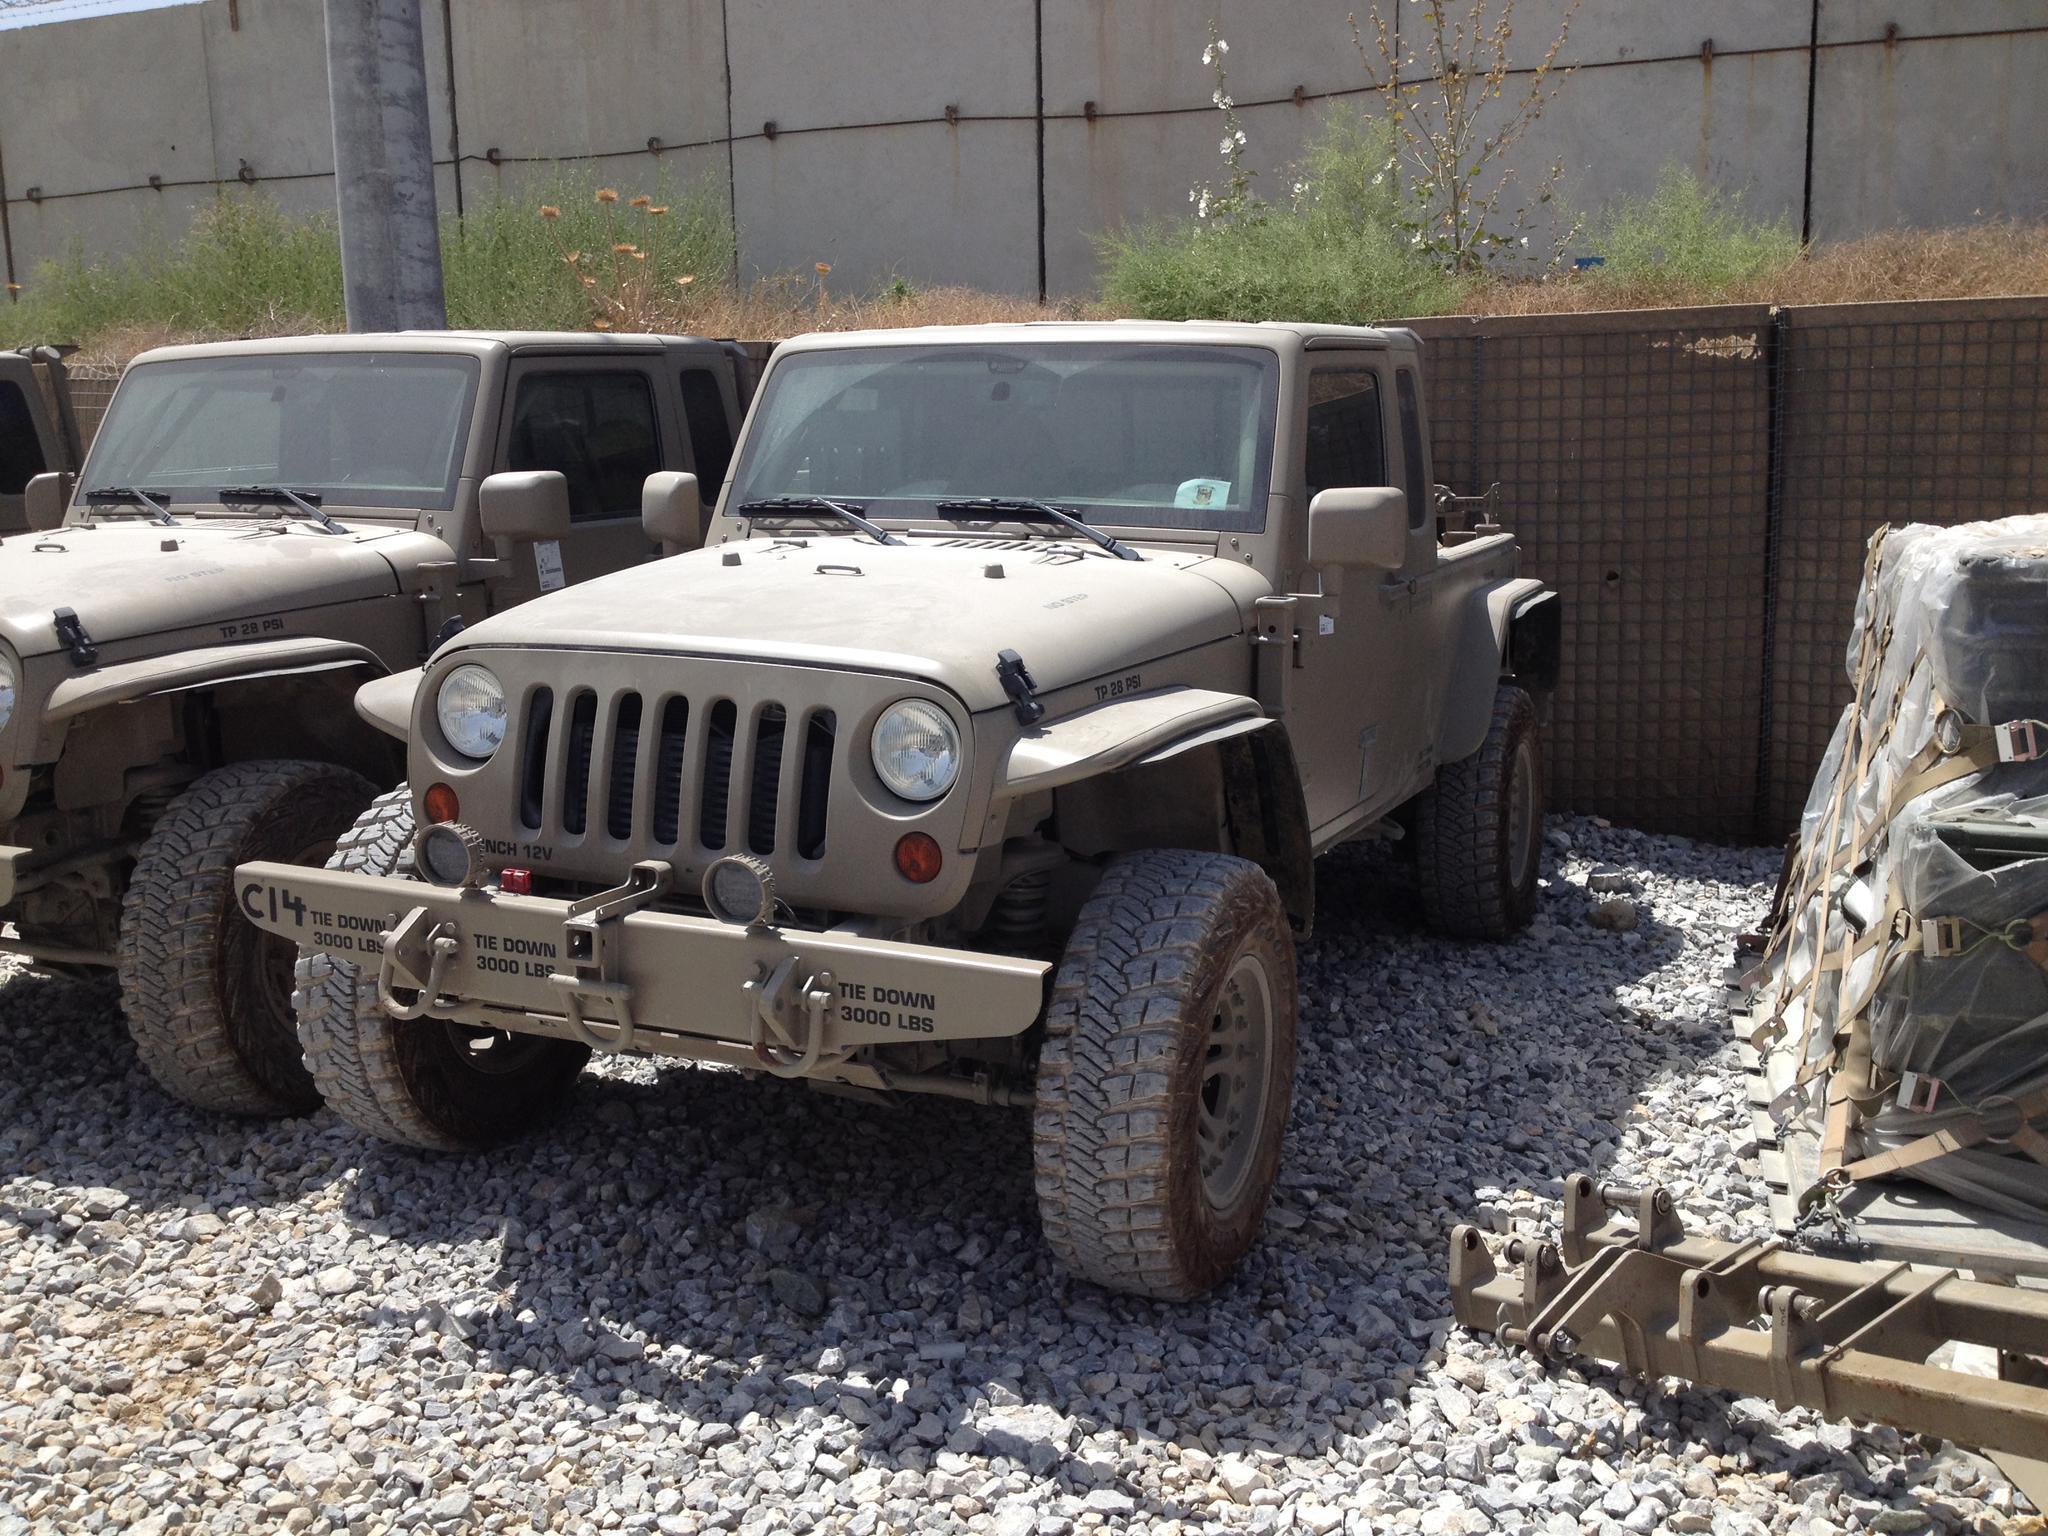 Jeep Wrangler Diesel >> 2017 Jeep Wrangler pickup - Page 6 - Toyota FJ Cruiser Forum